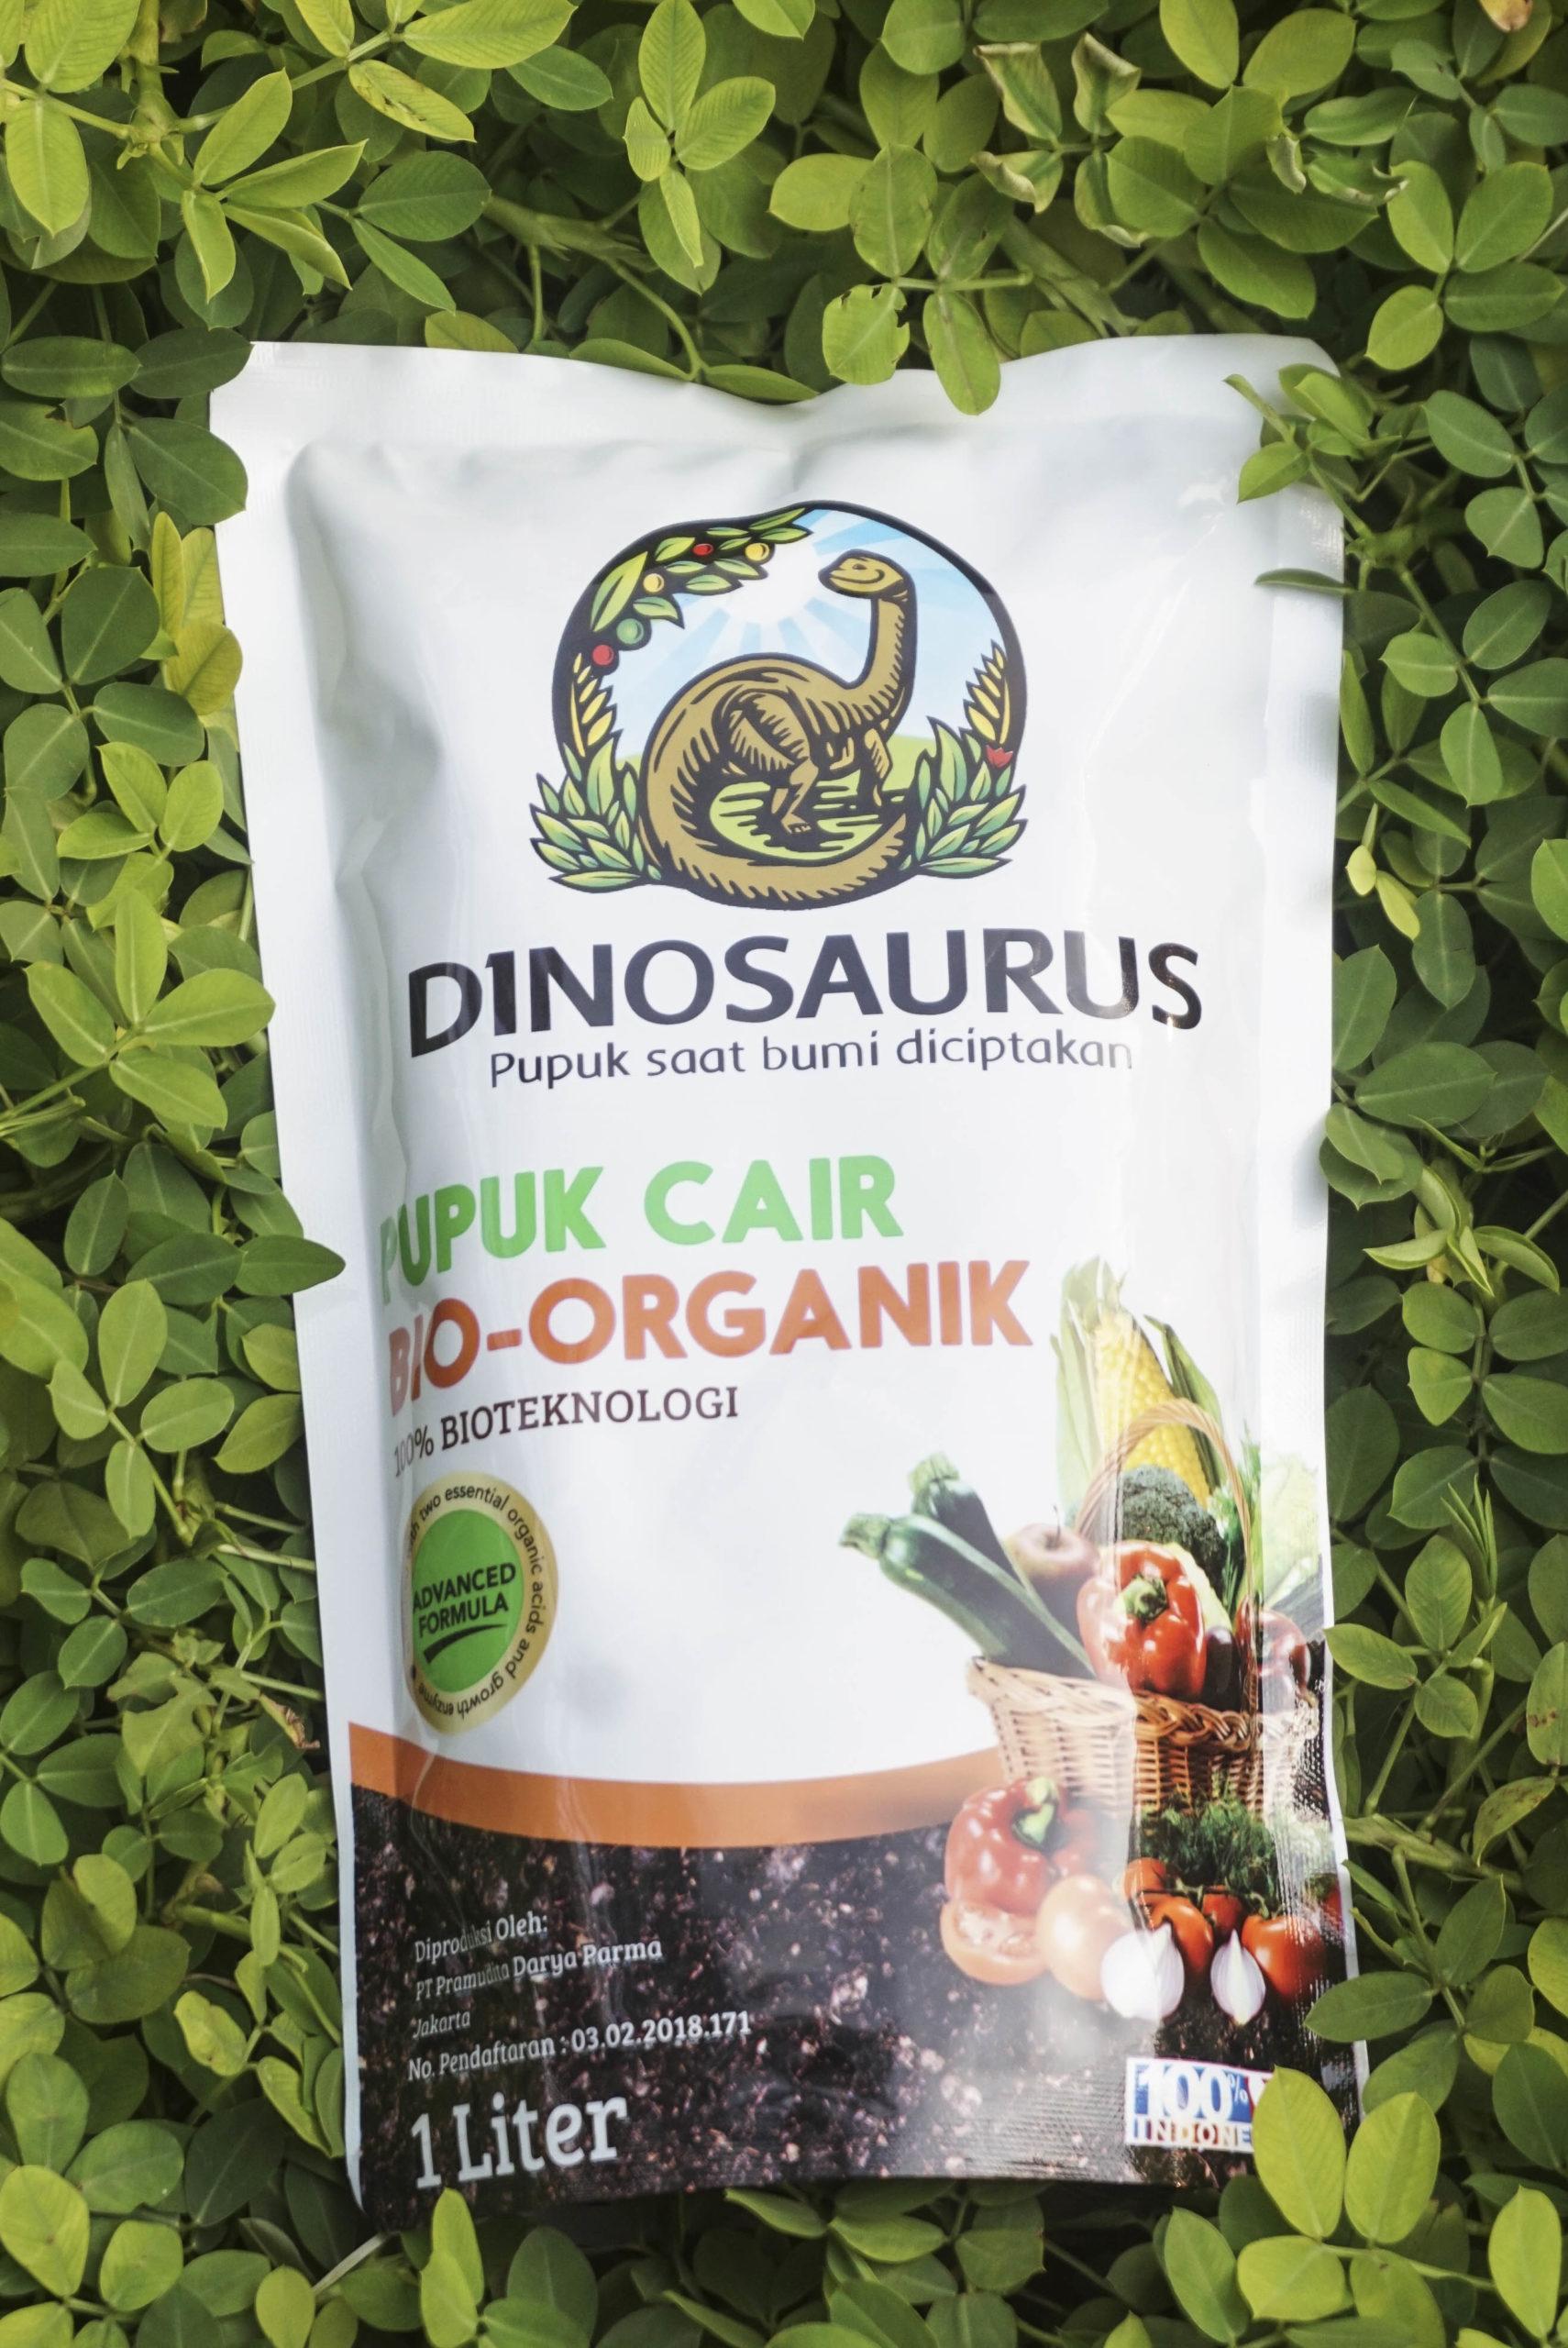 Pupuk Dinosaurus 1 liter